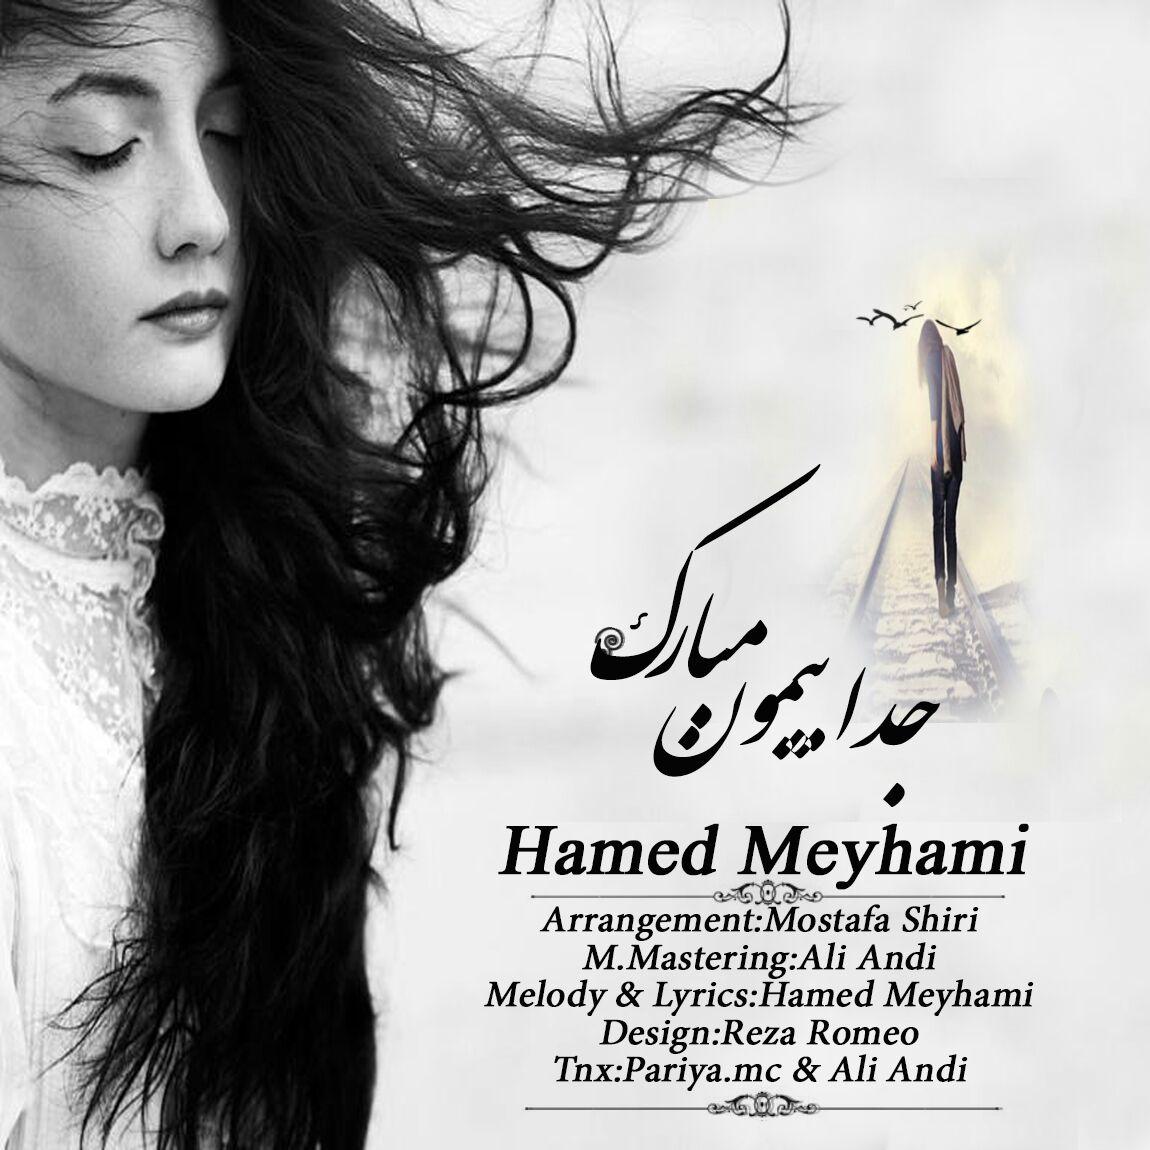 Hamed-meyhami_حامد-میهامی